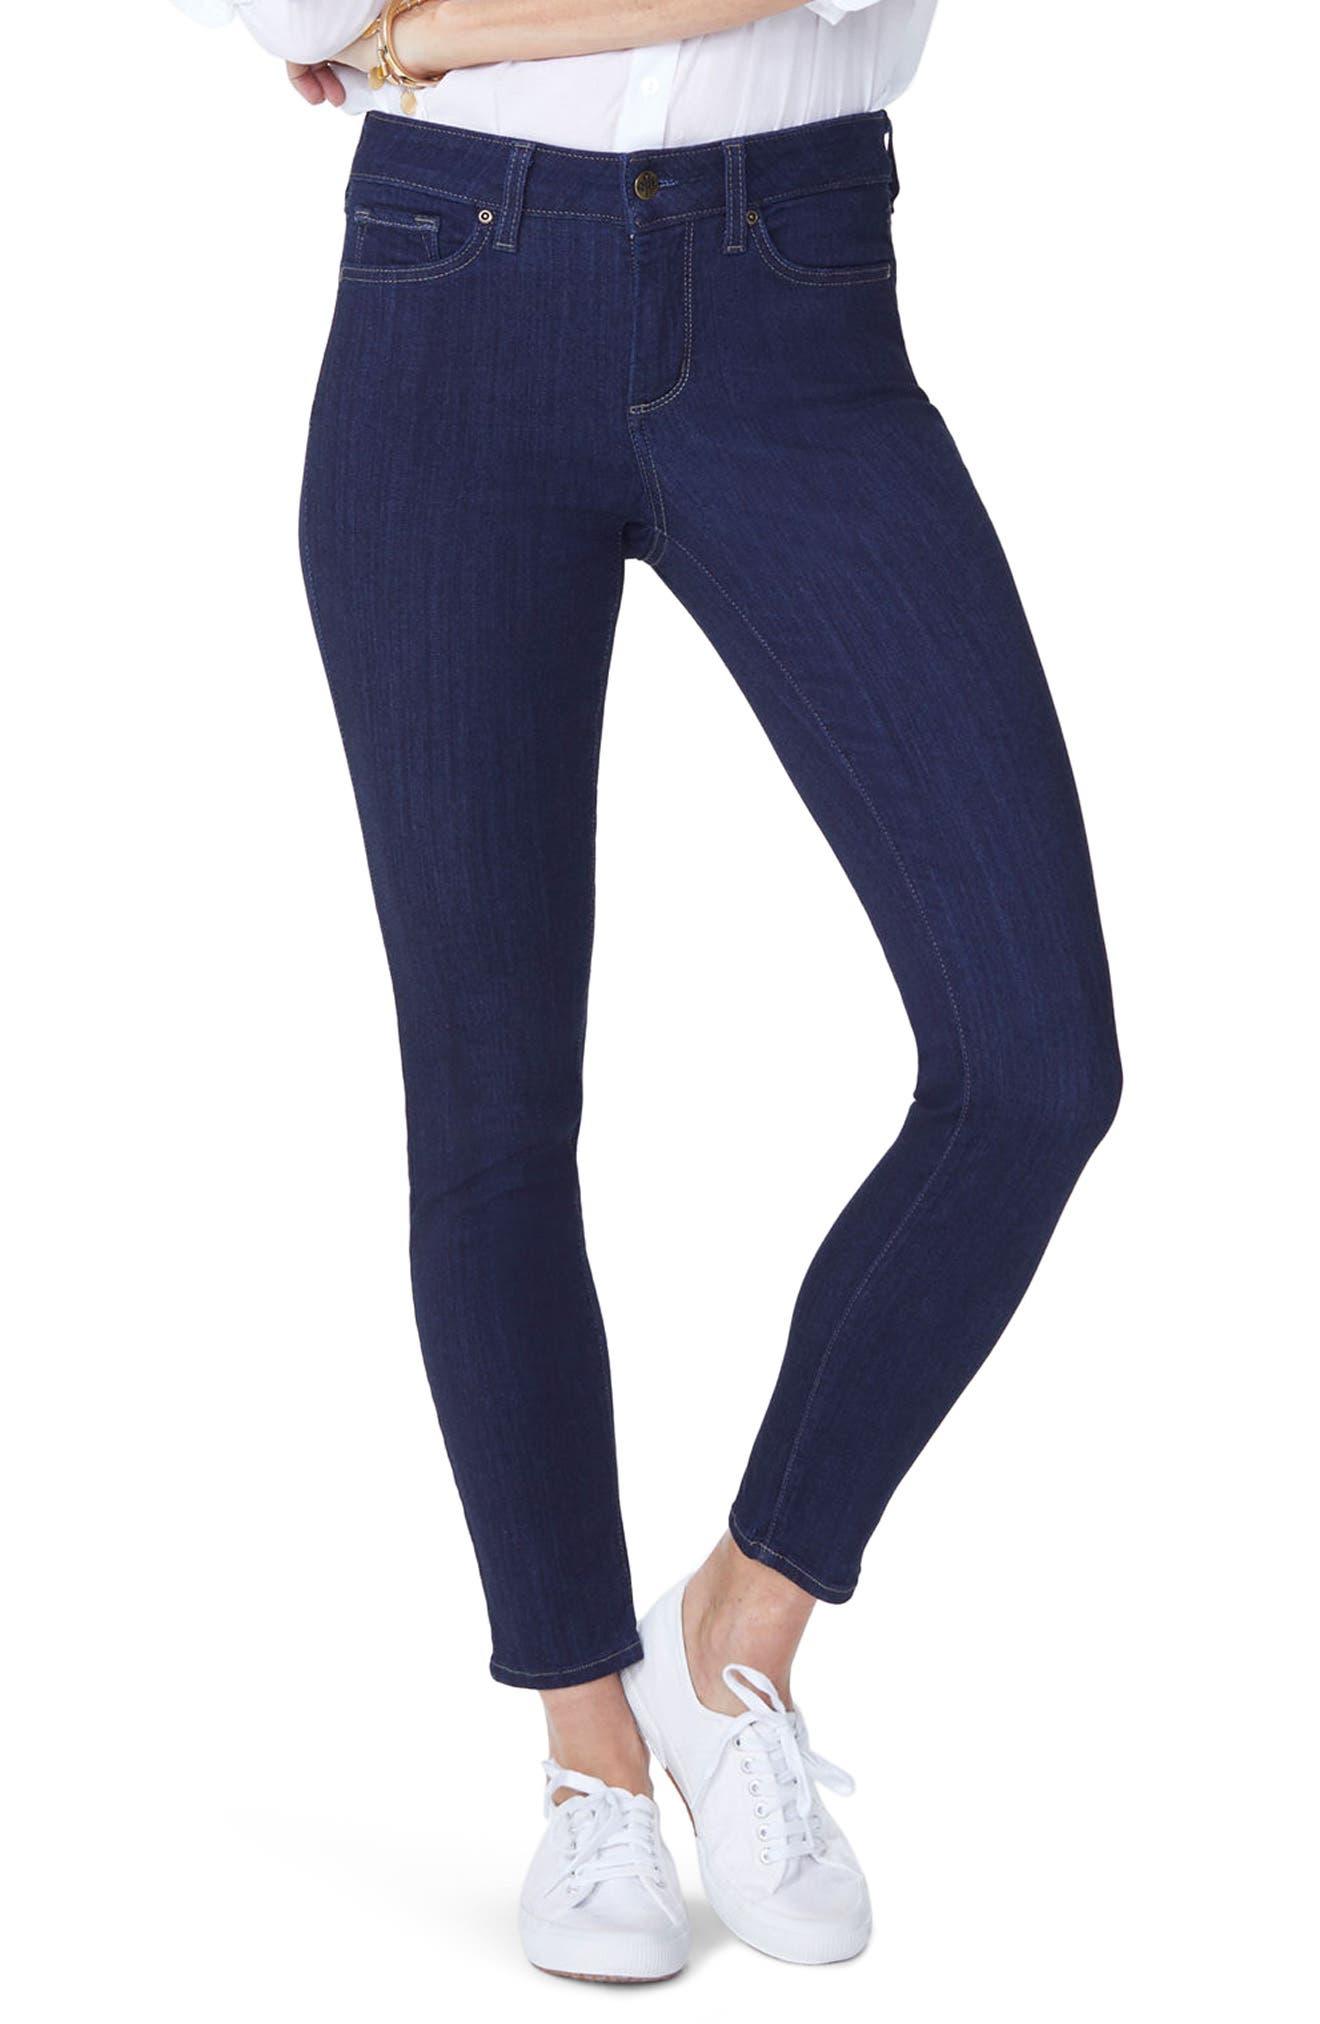 Ami Skinny Jeans,                         Main,                         color, Mabel